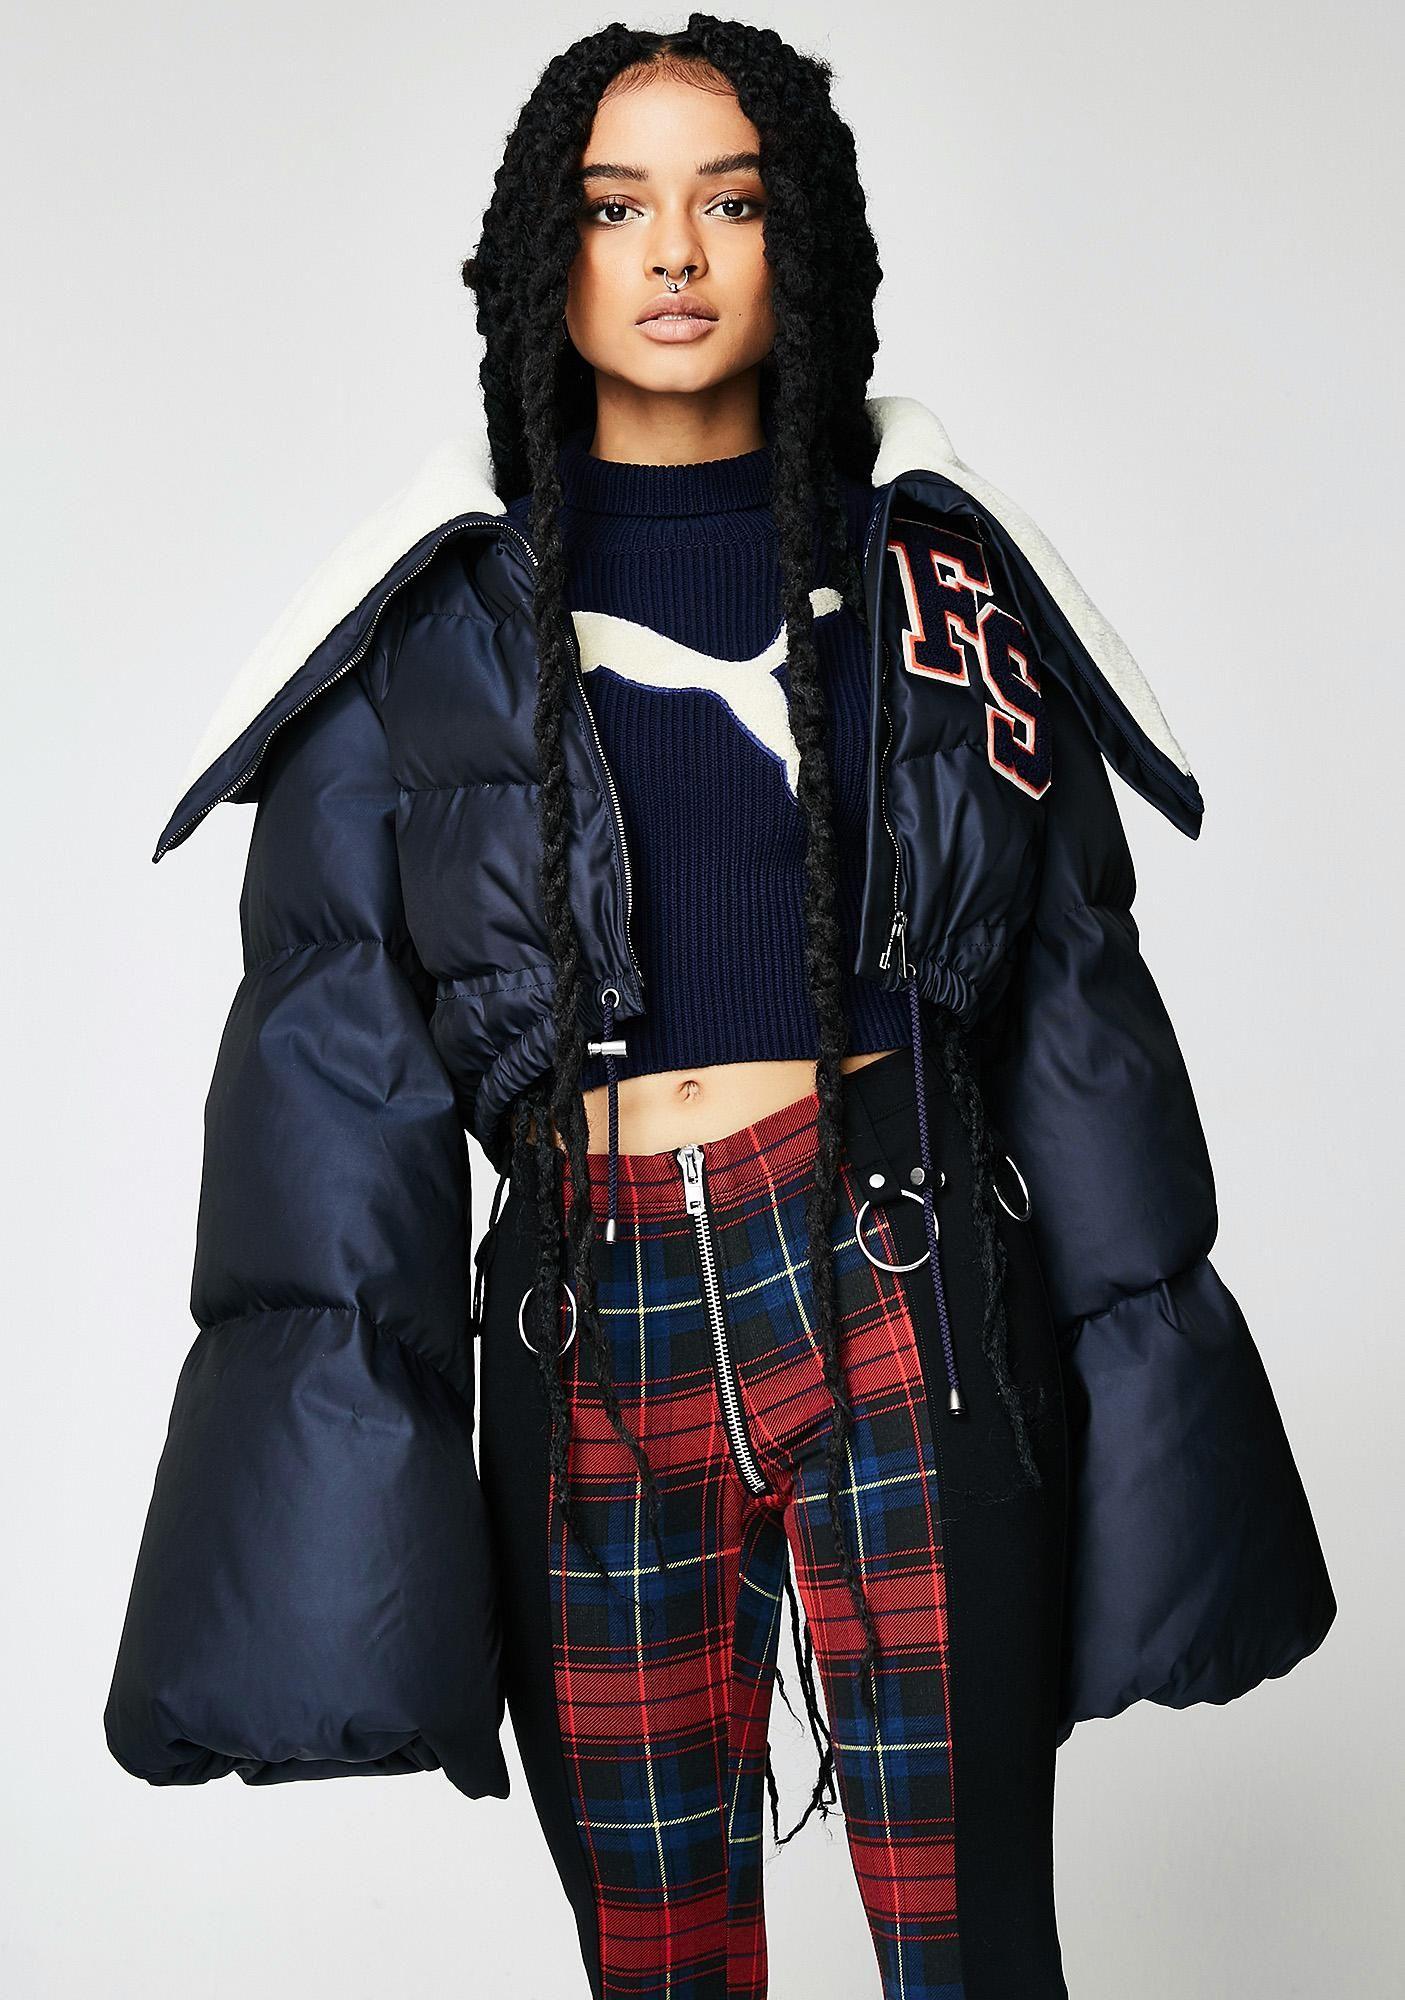 Puma Fenty Puma By Rihanna Funnel Collar Quilted Jacket Cuz You Just Tryna Get Cozy Af This Quilted Jacket Has A Logo P Quilted Jacket Cocktail Jacket Fashion [ 2000 x 1405 Pixel ]